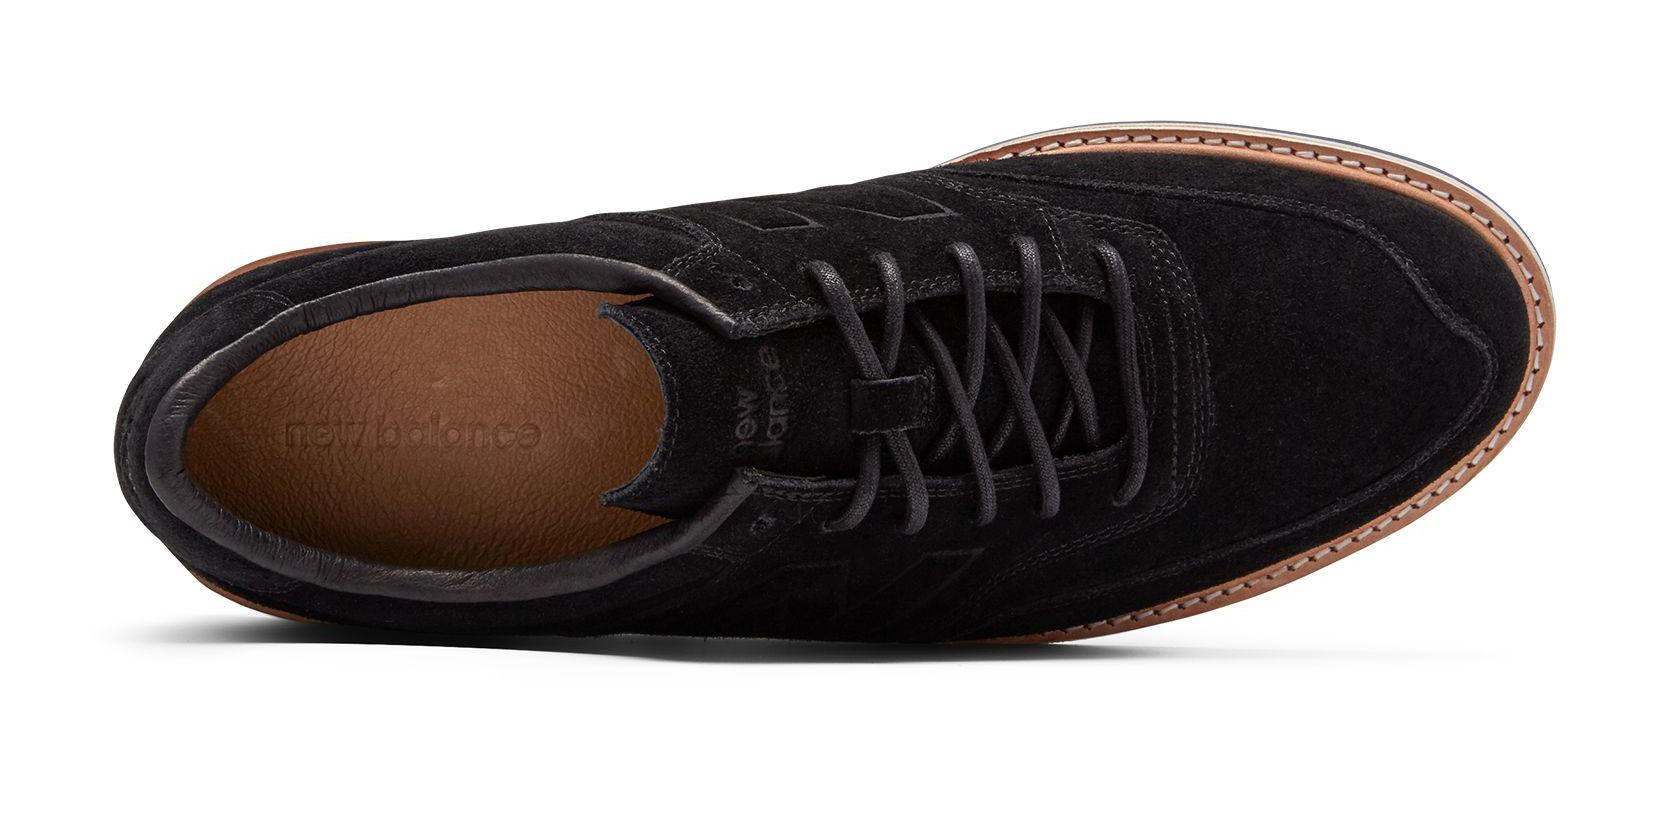 Shoe Review: New Balance 1100   Kintec